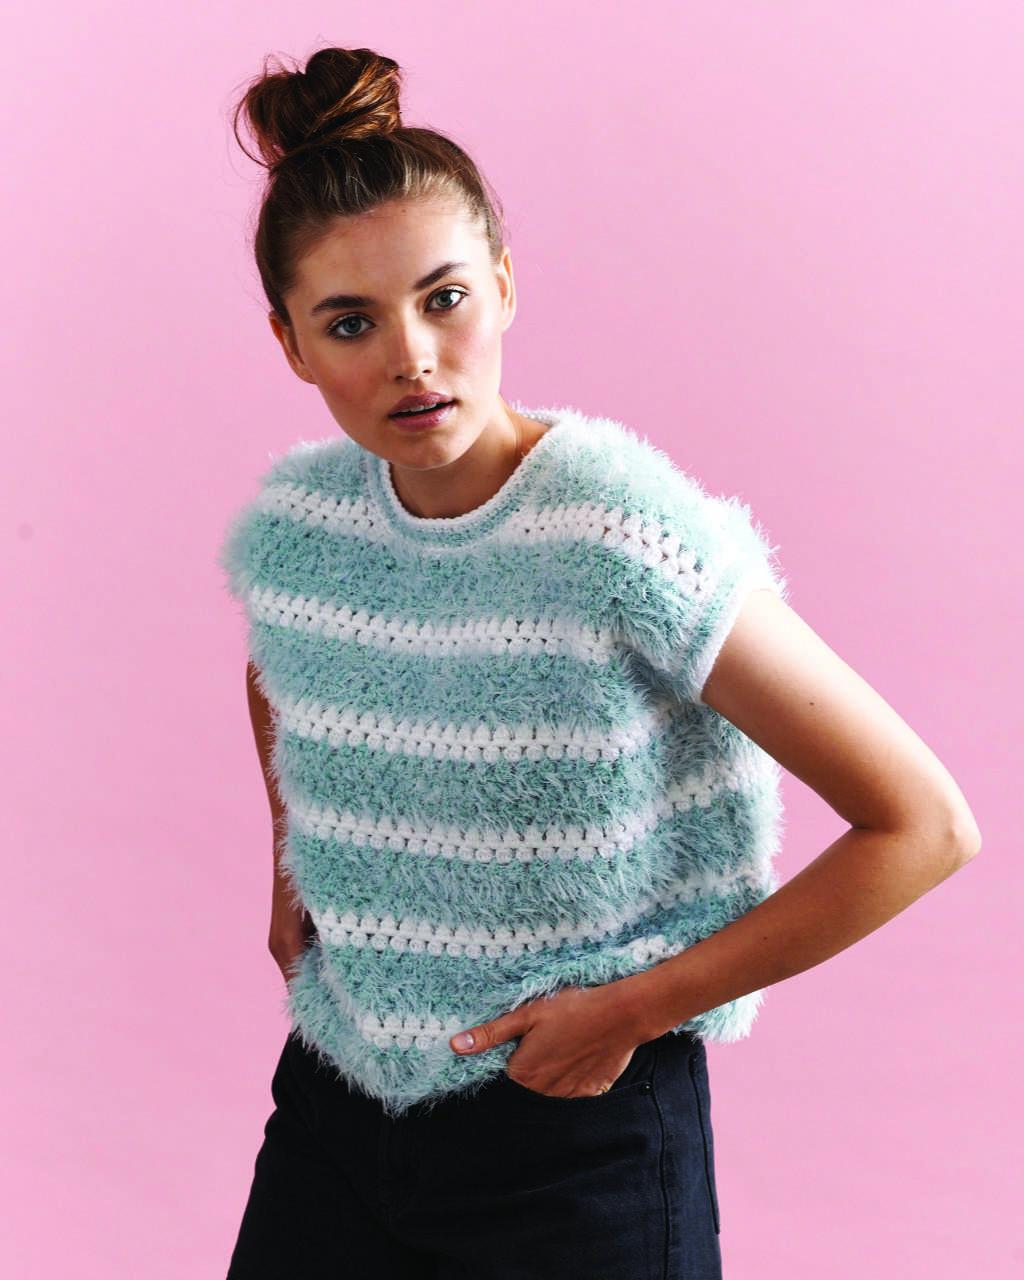 Panda Minky Plush - Crochet Cropped Top